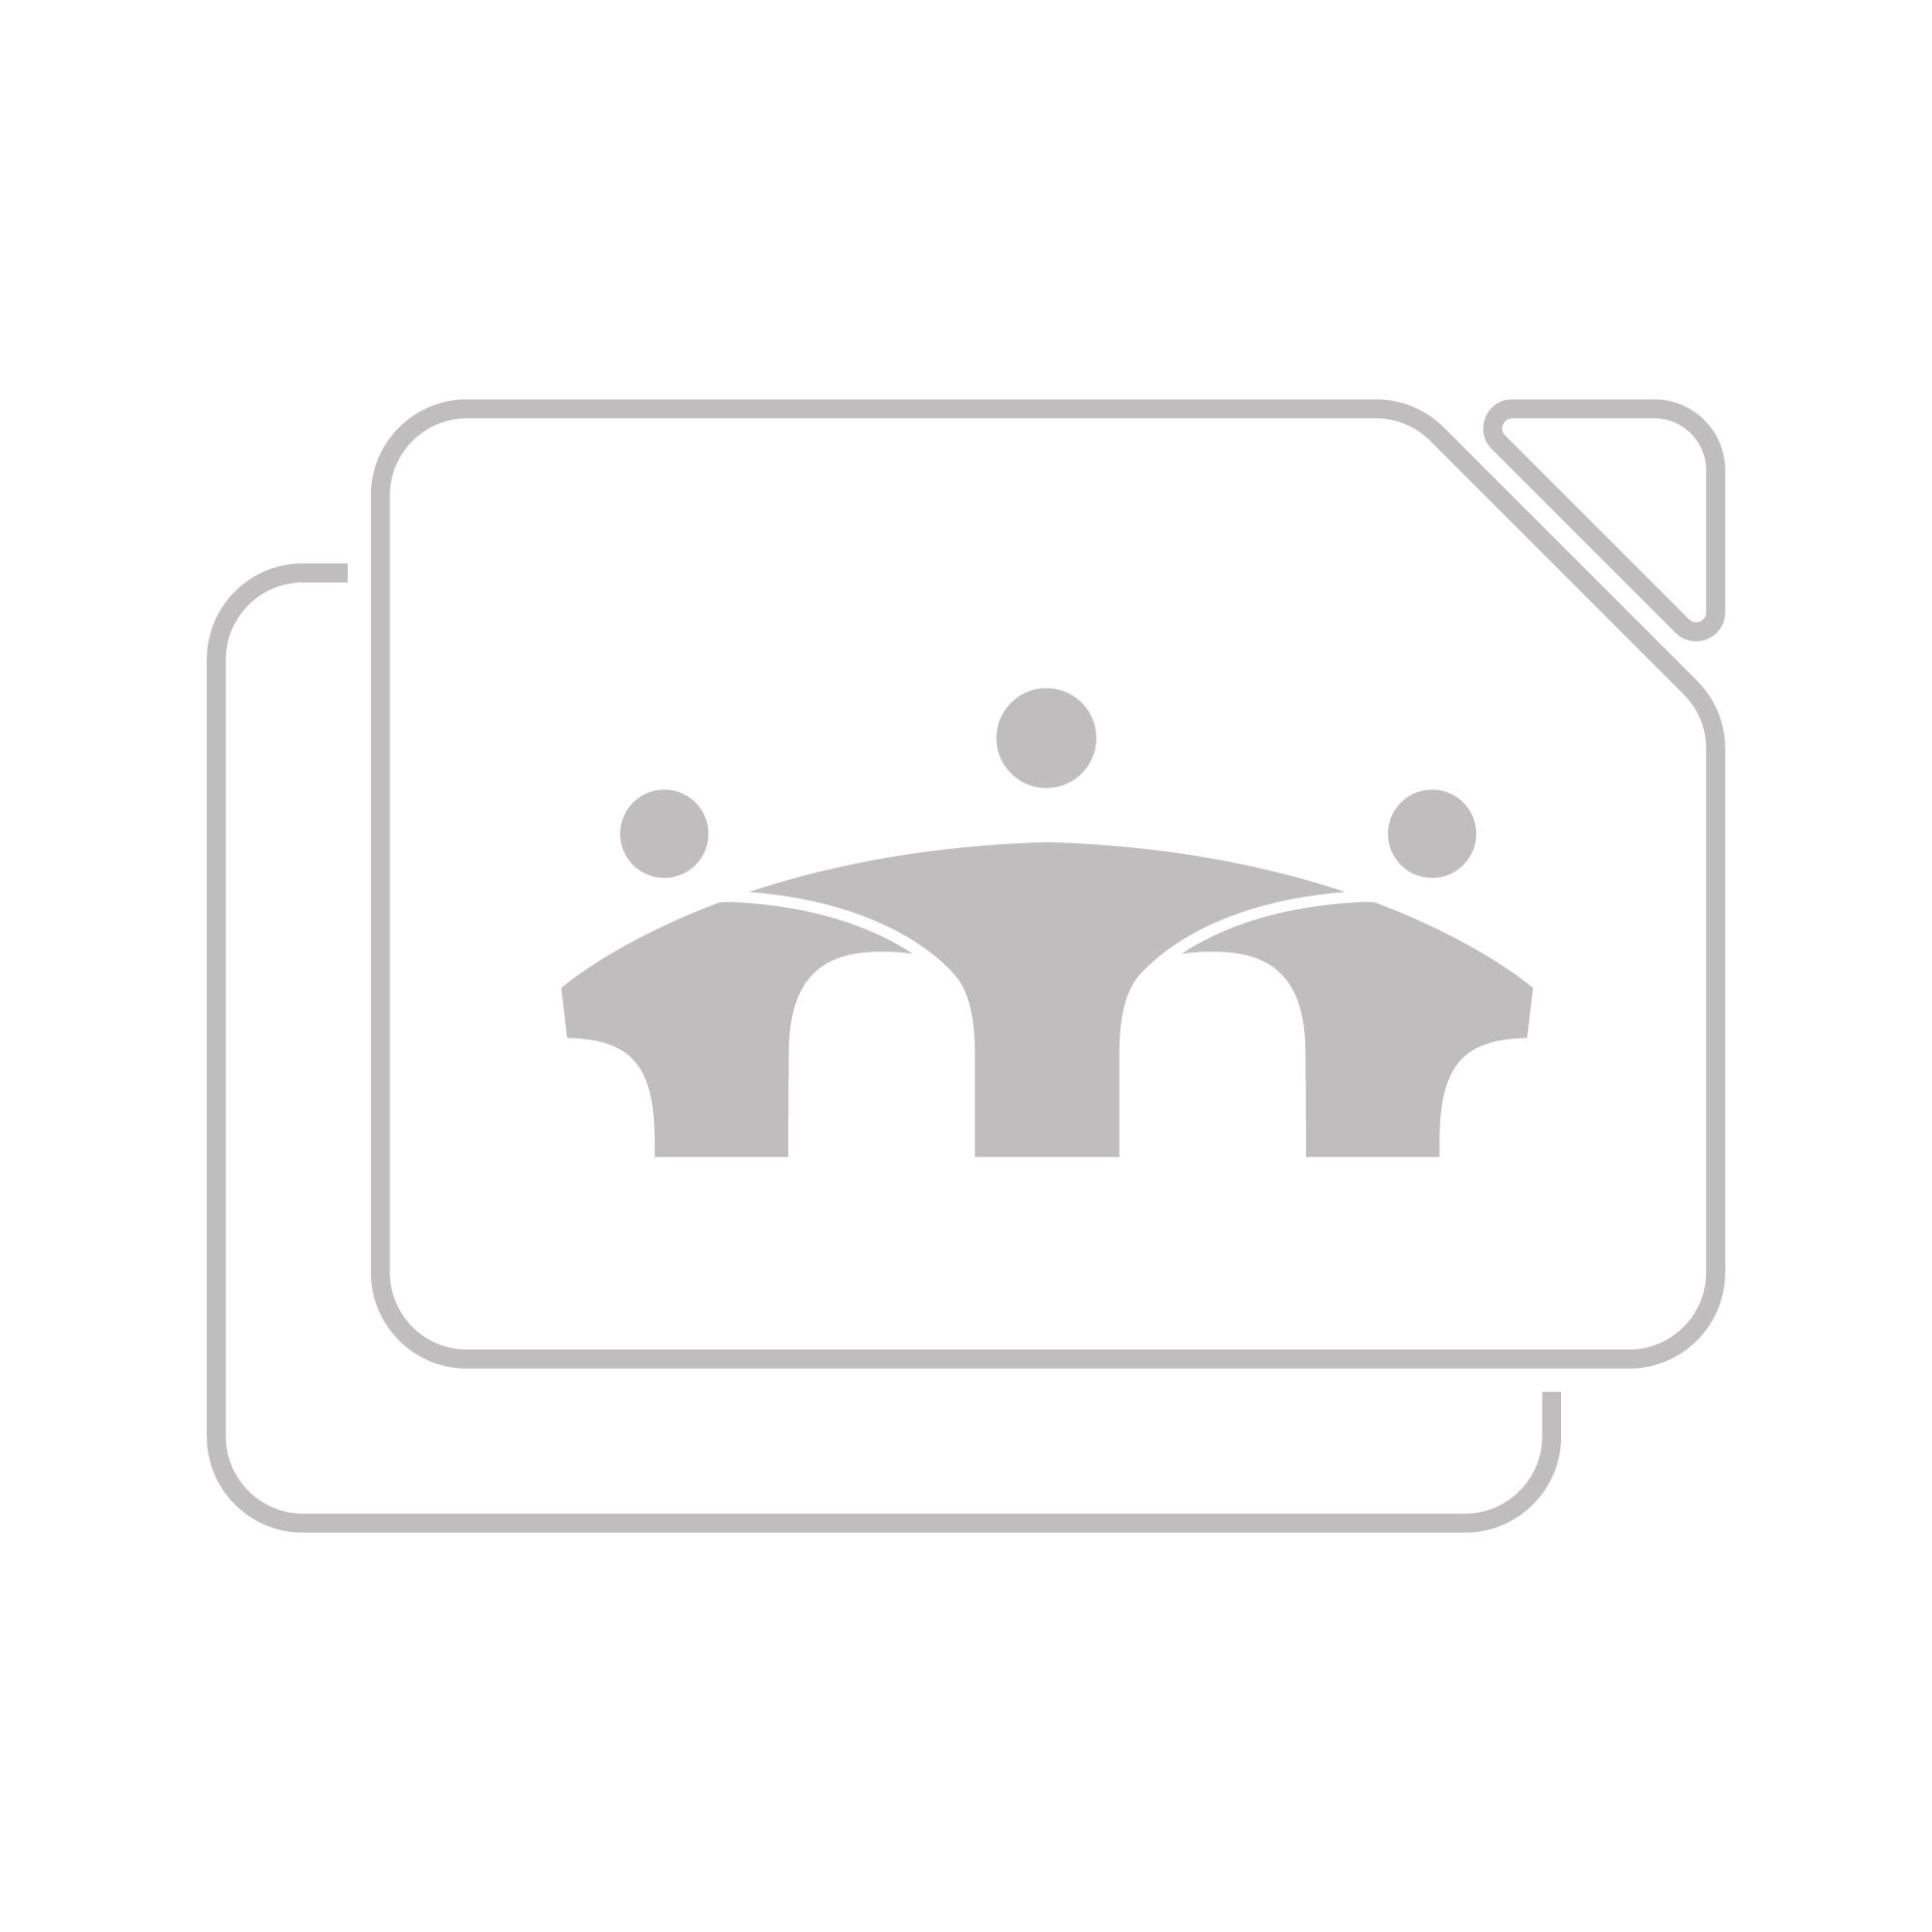 Logitech Logitech Group - N/A - HUB - WW